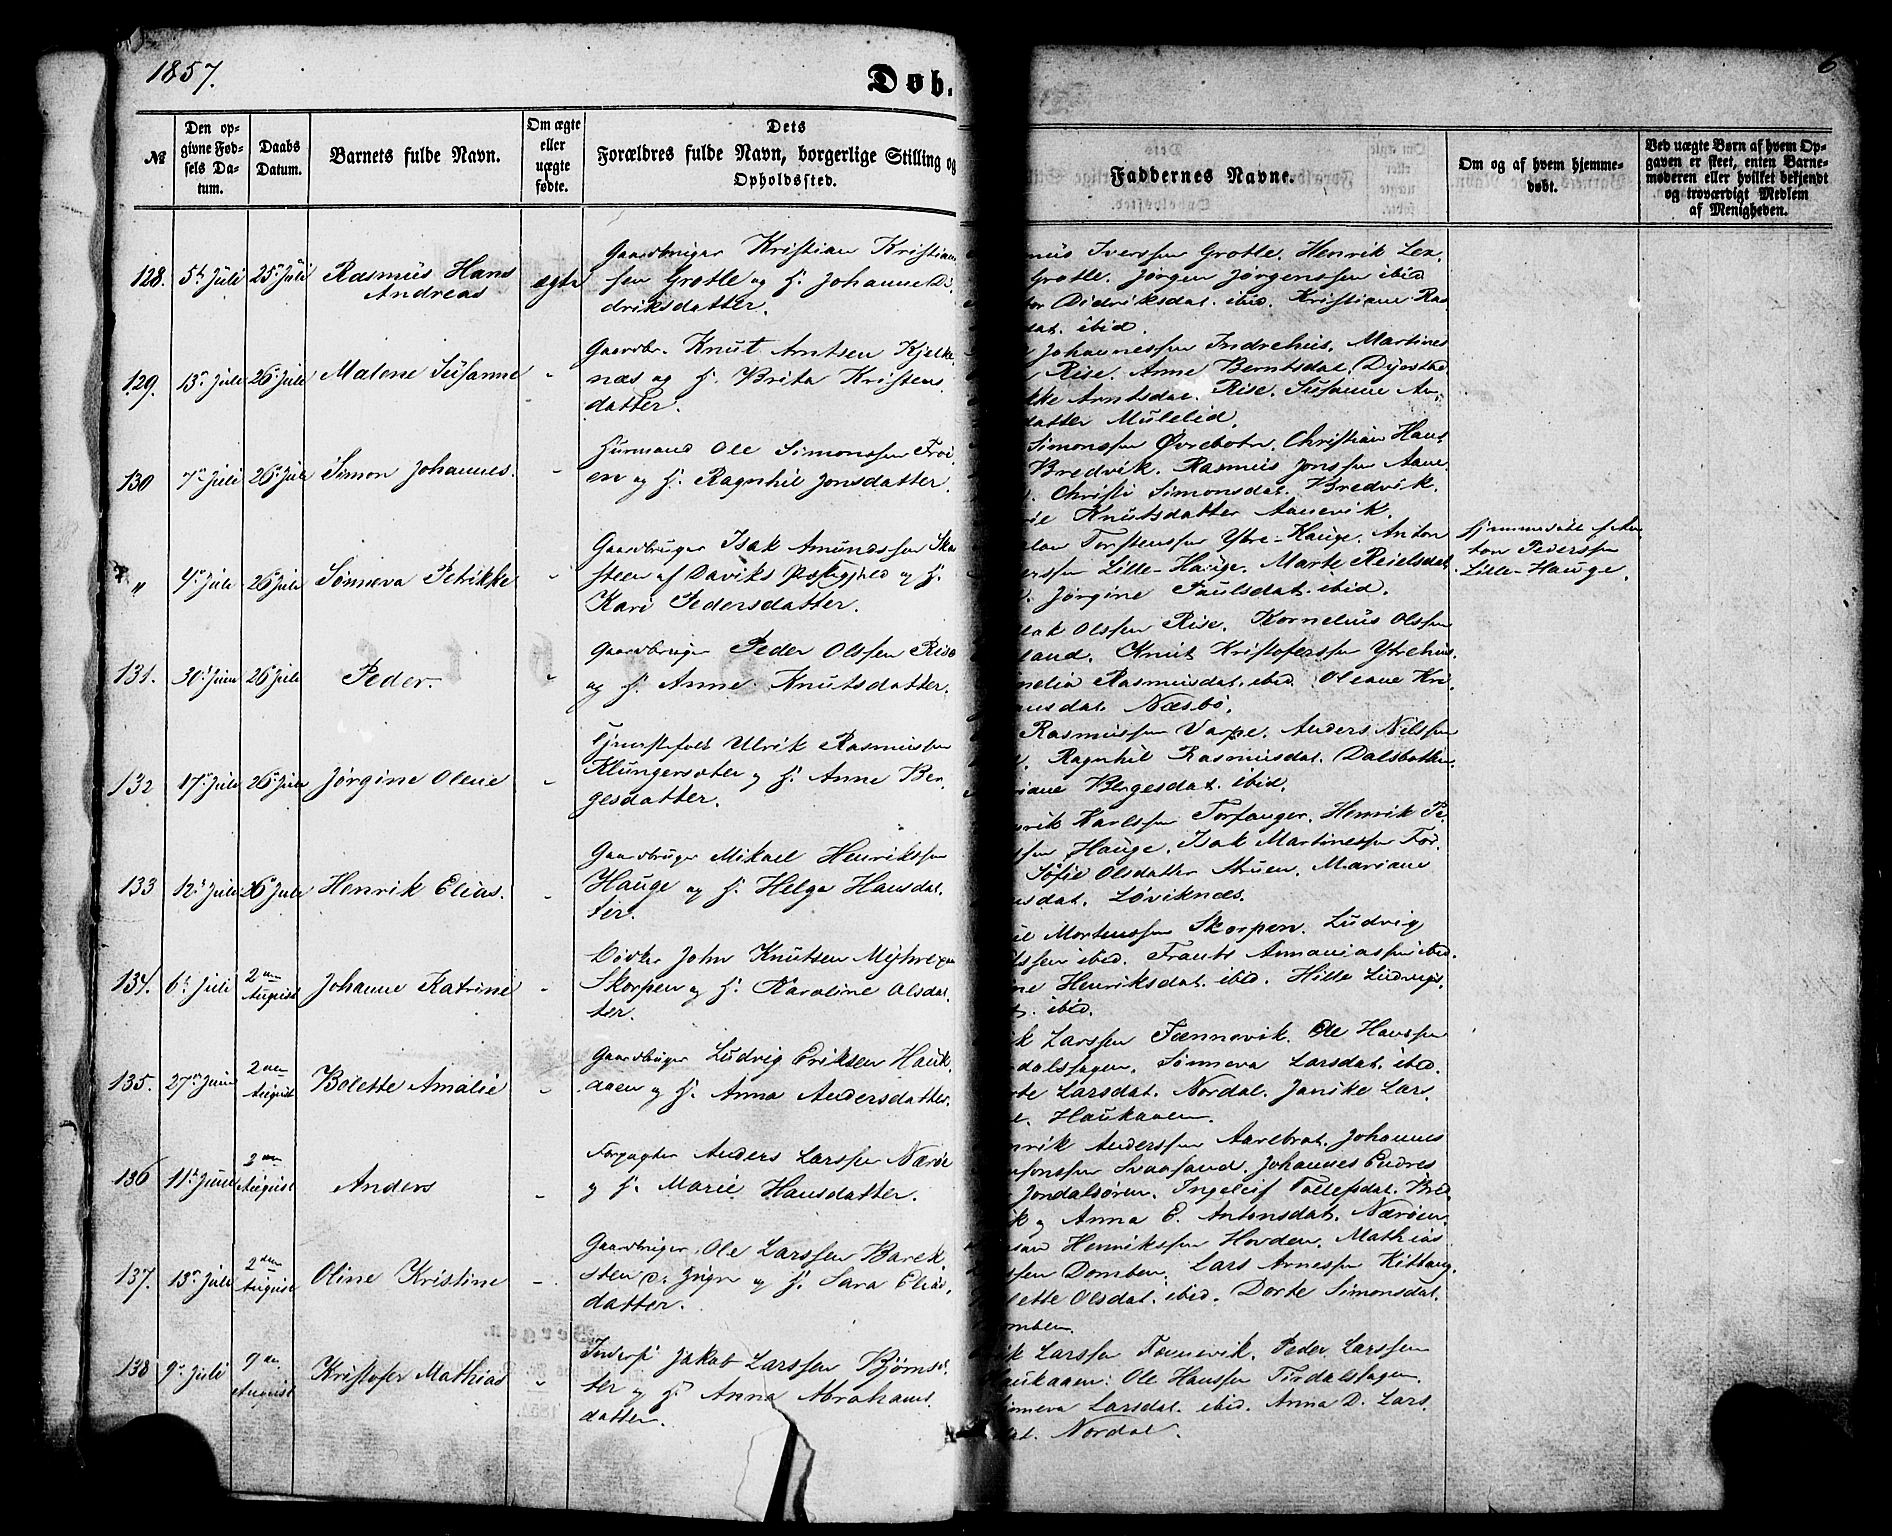 SAB, Kinn sokneprestembete, H/Haa/Haaa/L0006: Ministerialbok nr. A 6, 1857-1885, s. 6